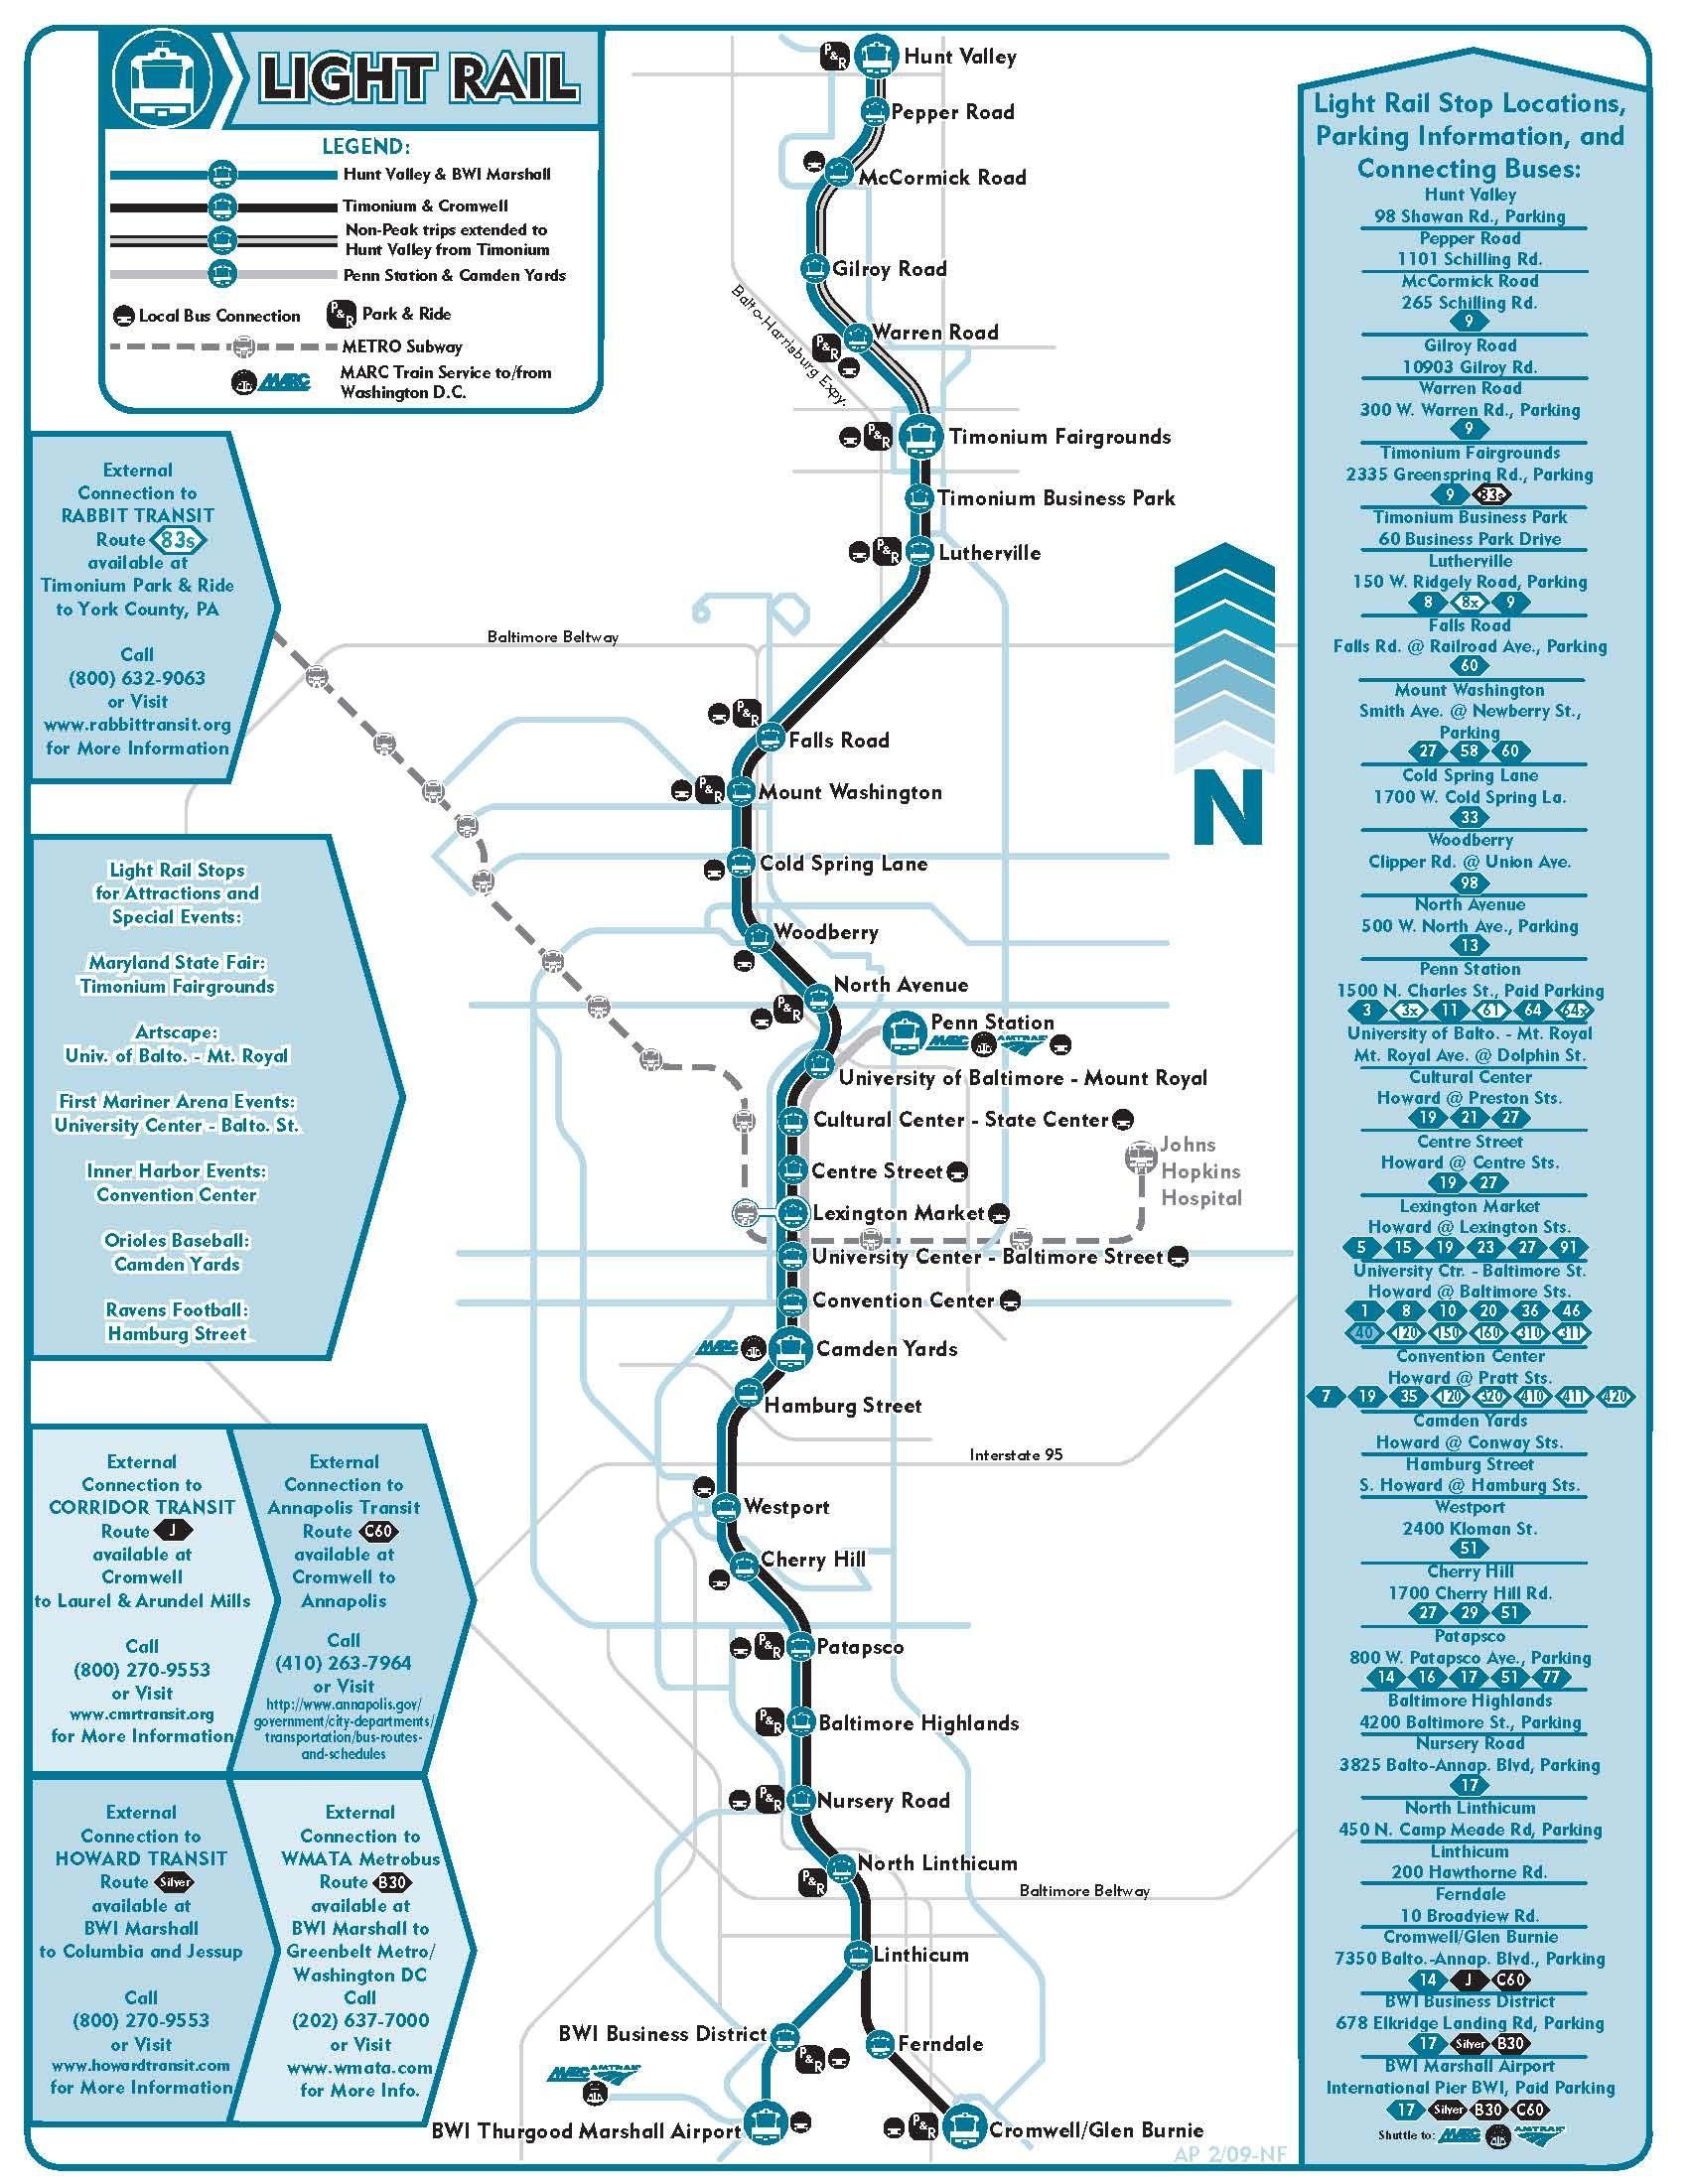 Baltimore Light Rail Map Pin by Raj B on Maryland | Baltimore map, Light rail, Baltimore